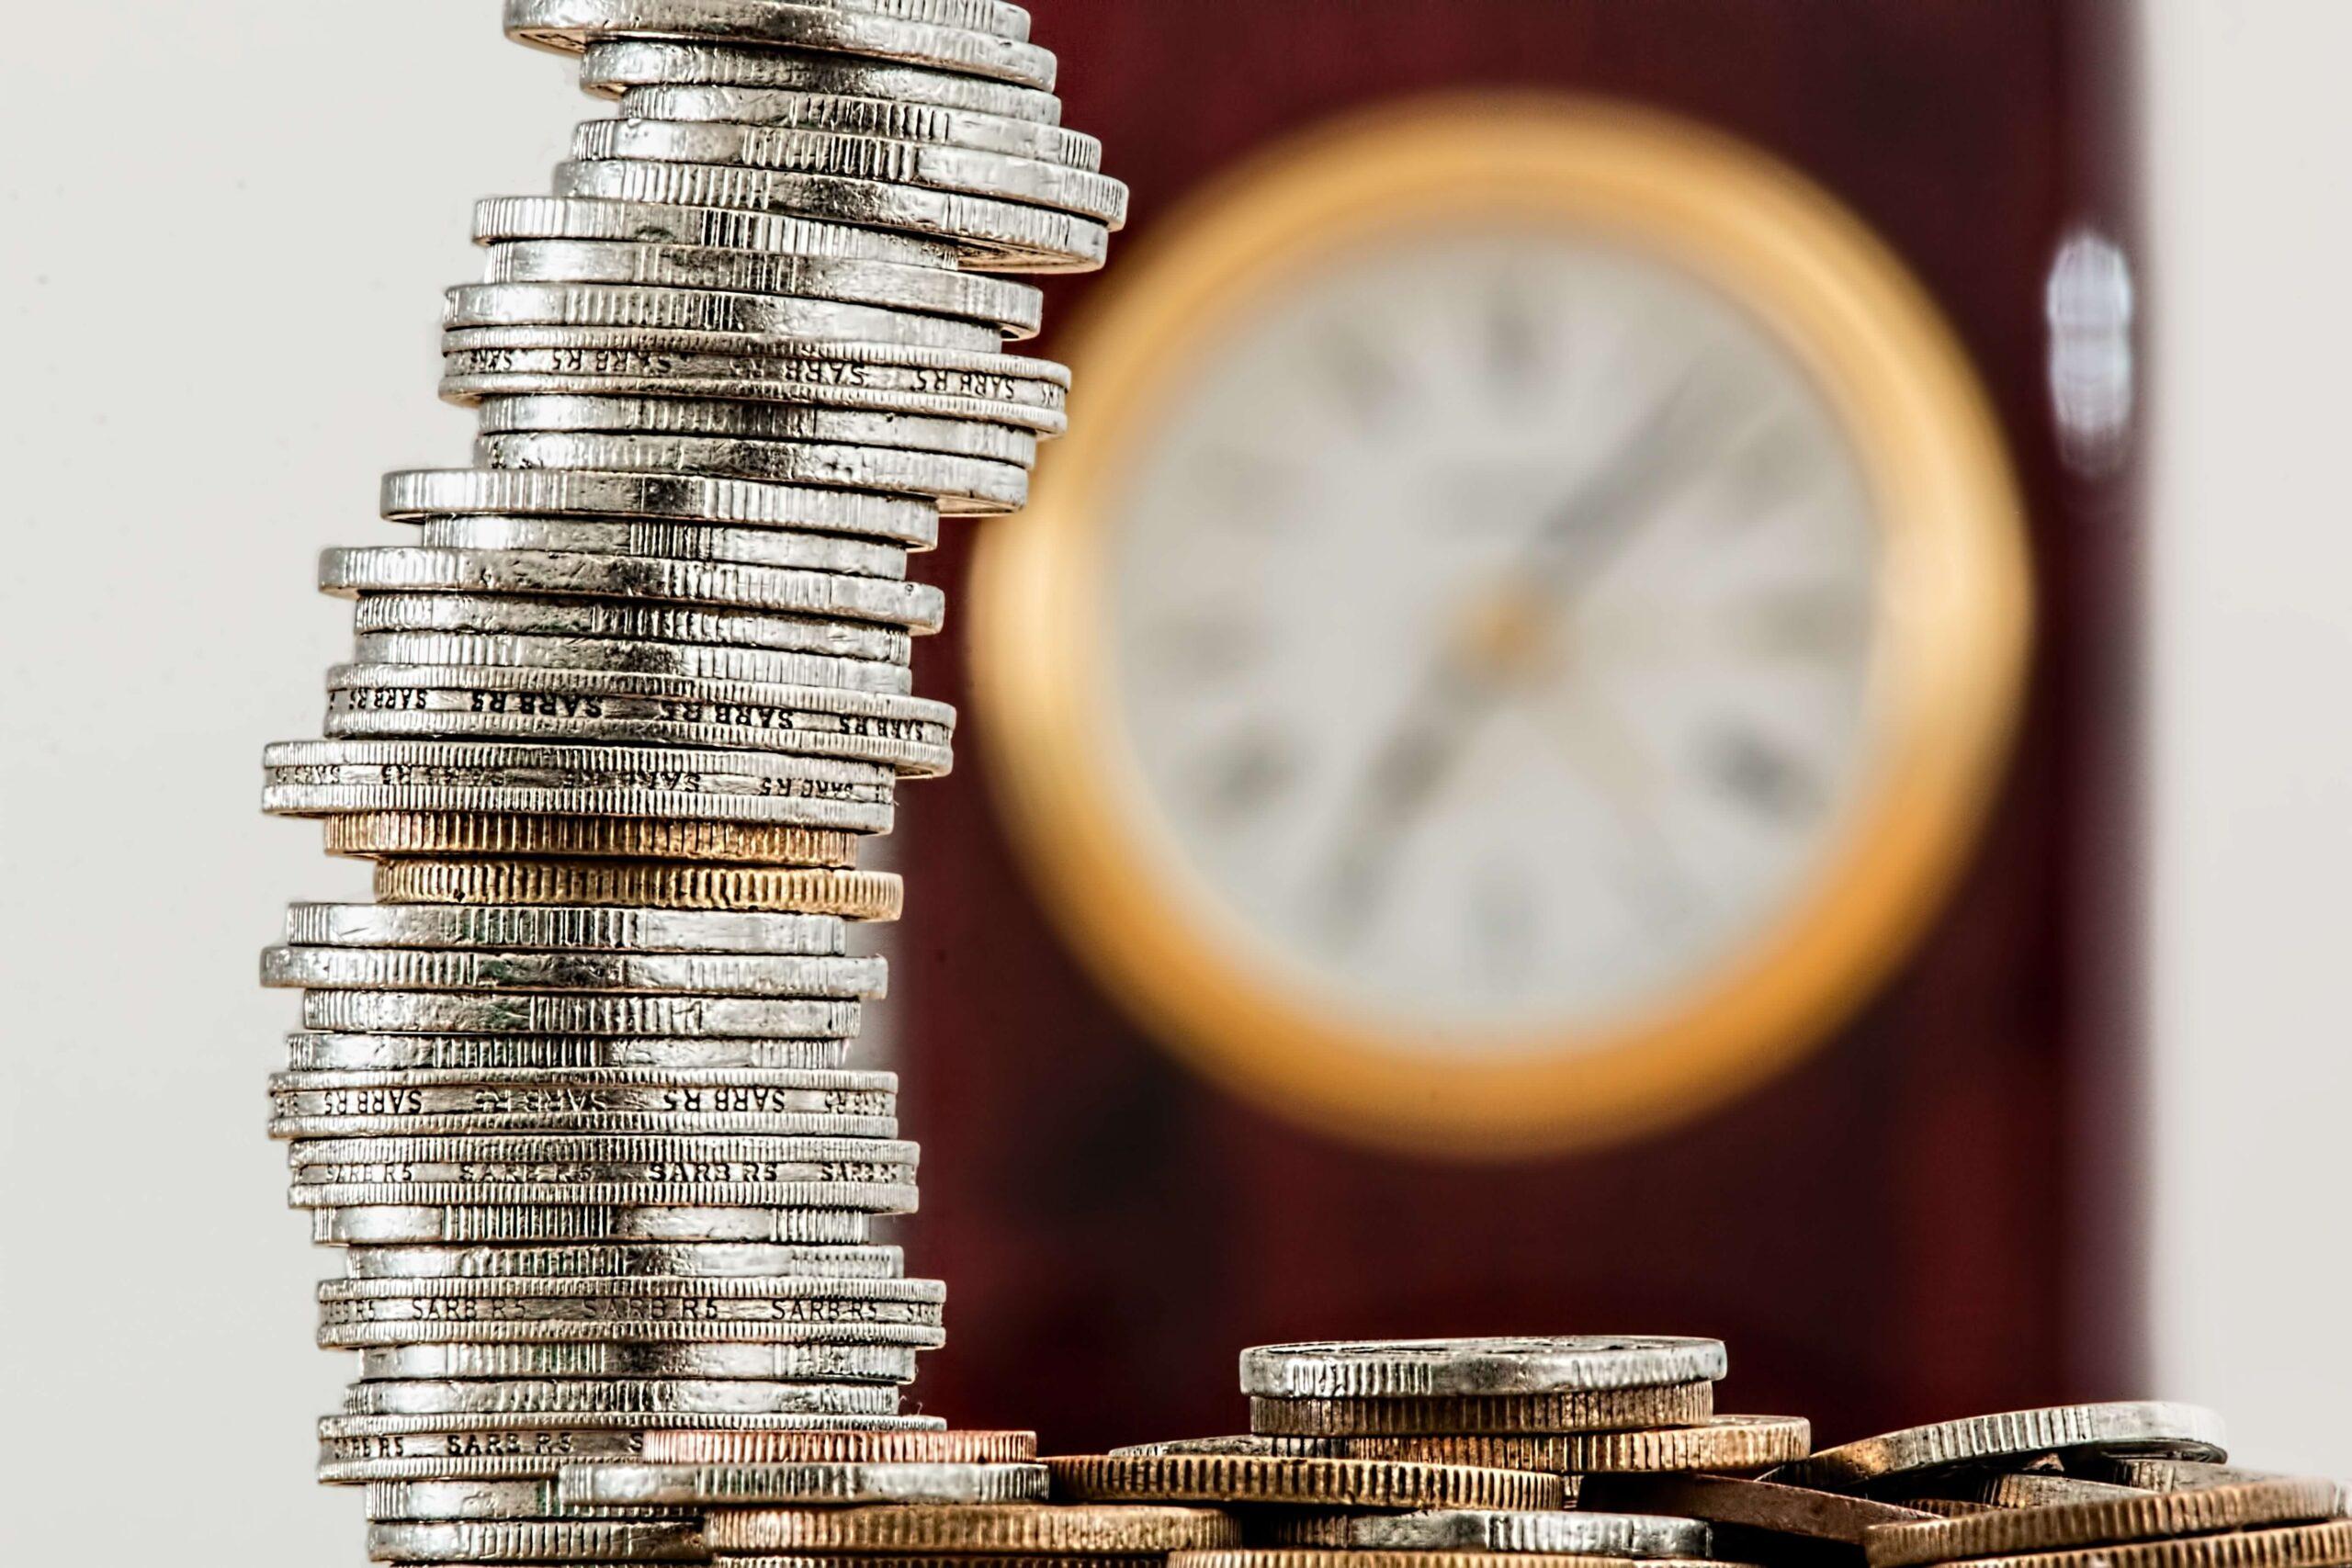 Pharm3r - financial and legal risk assessment